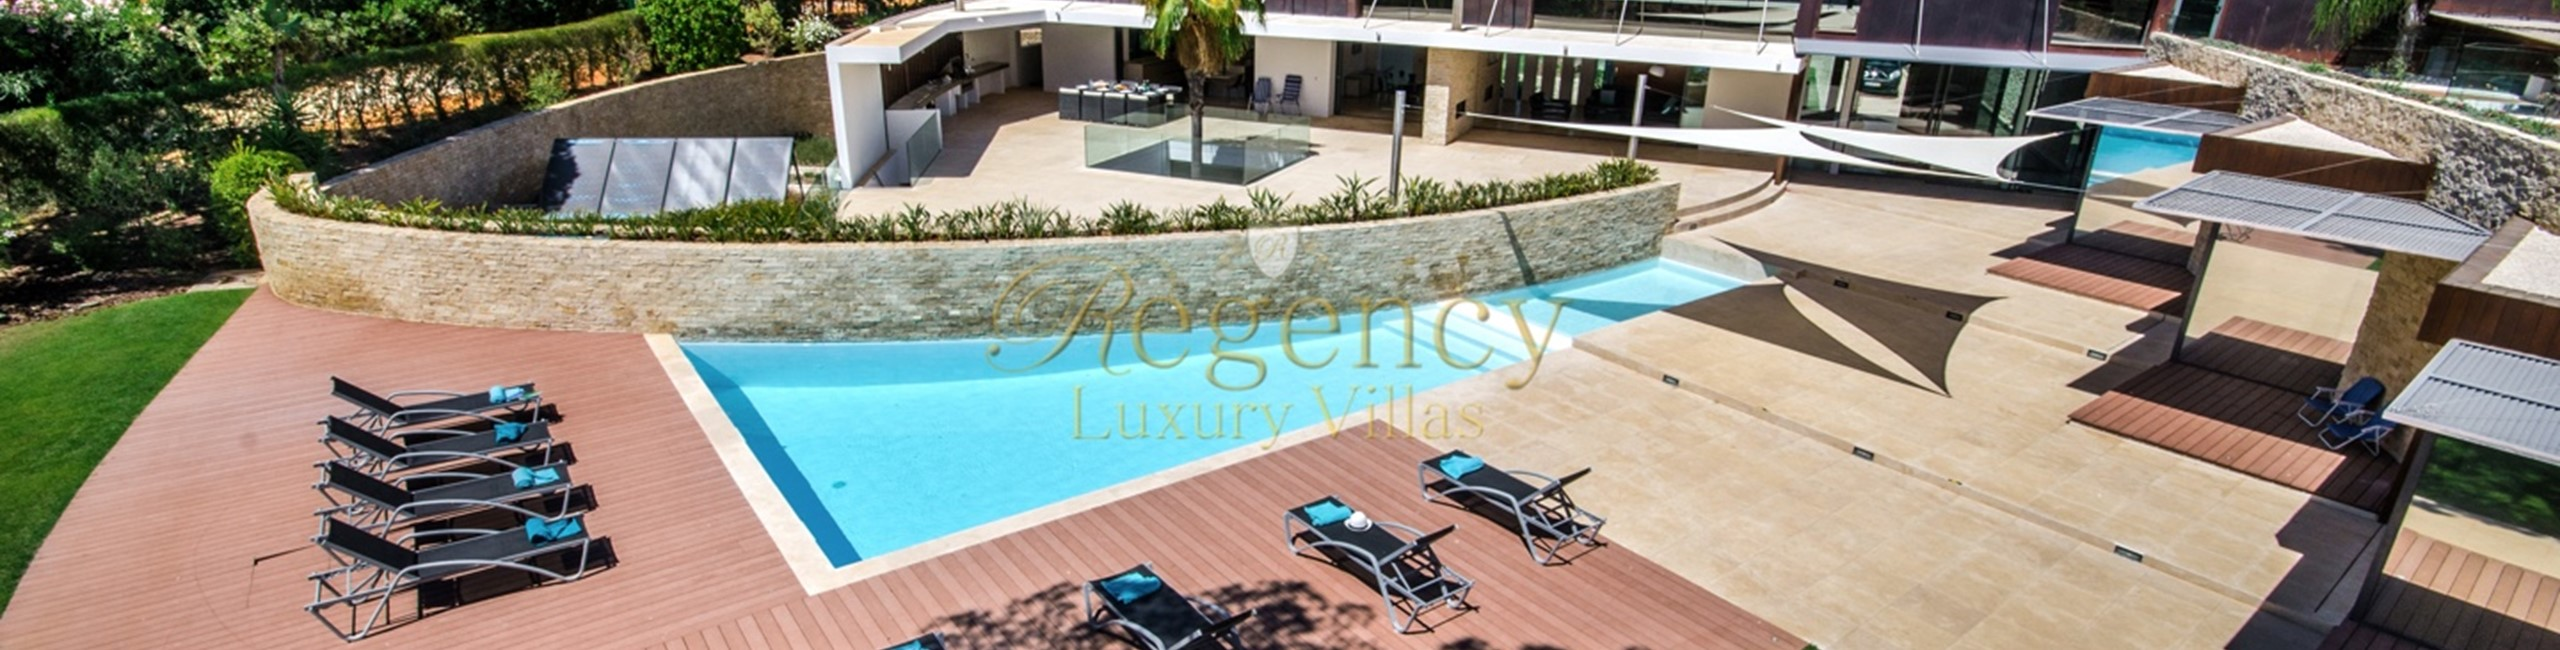 Villa To Rent In Vilamoura 6 Bedrooms Portugal